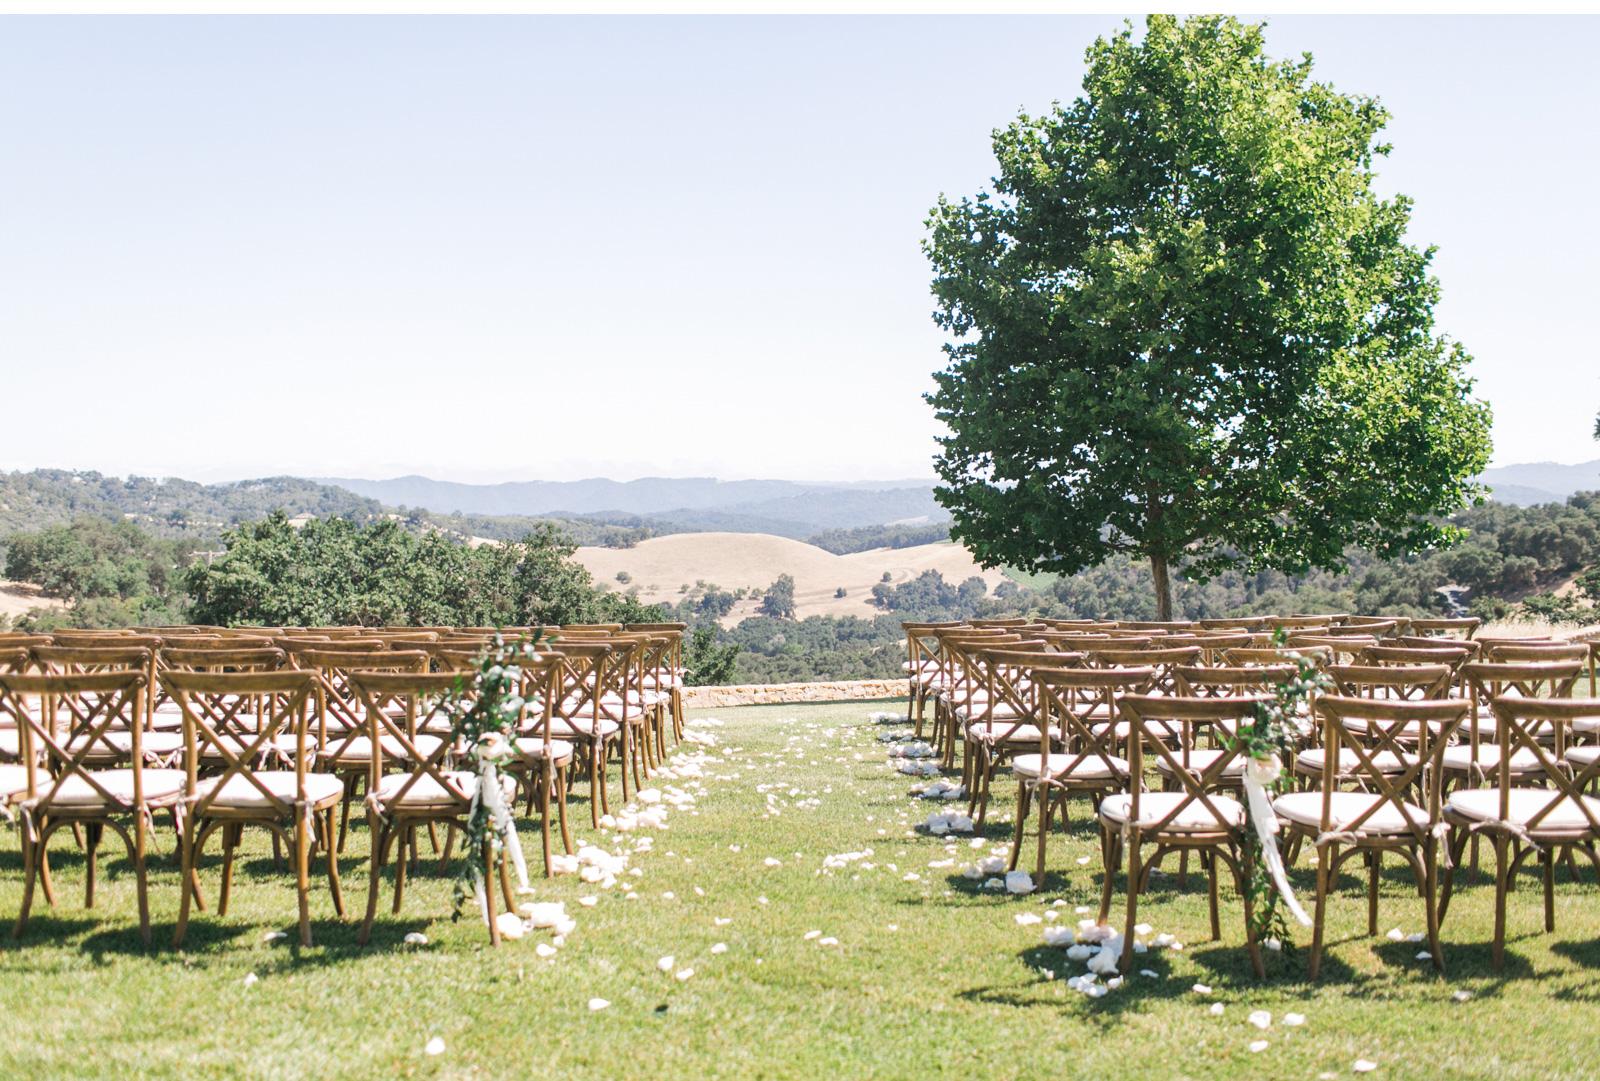 Style-Me-Pretty-California-Wedding-San-Luis-Obispo-Paso-Robles-Natalie-Schutt-Photography_01.jpg